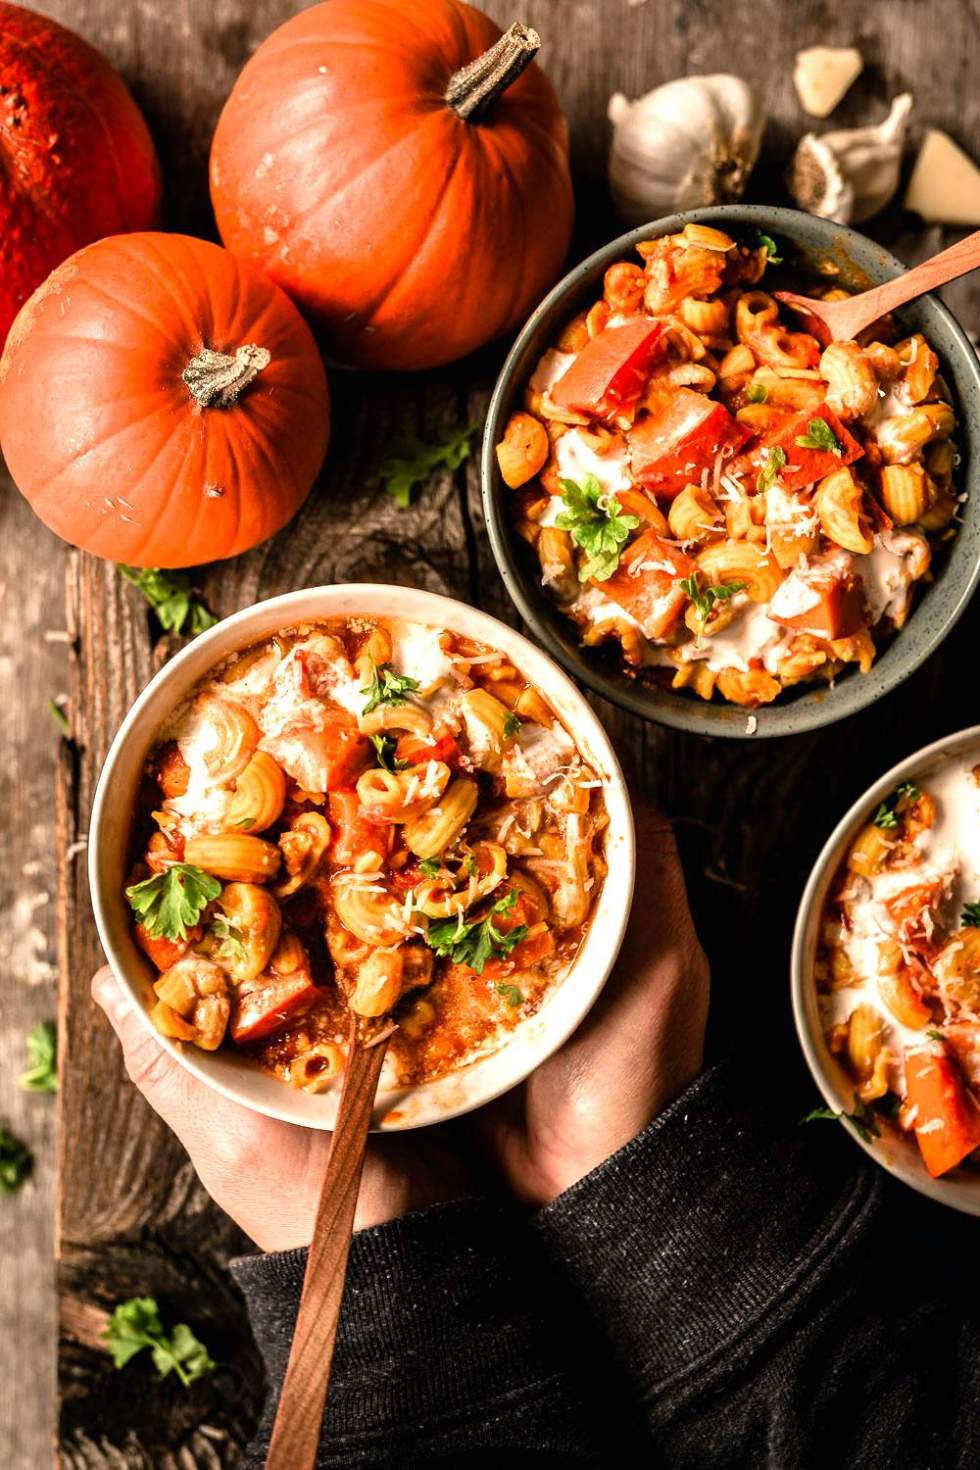 Pumpkin stew with macaroni